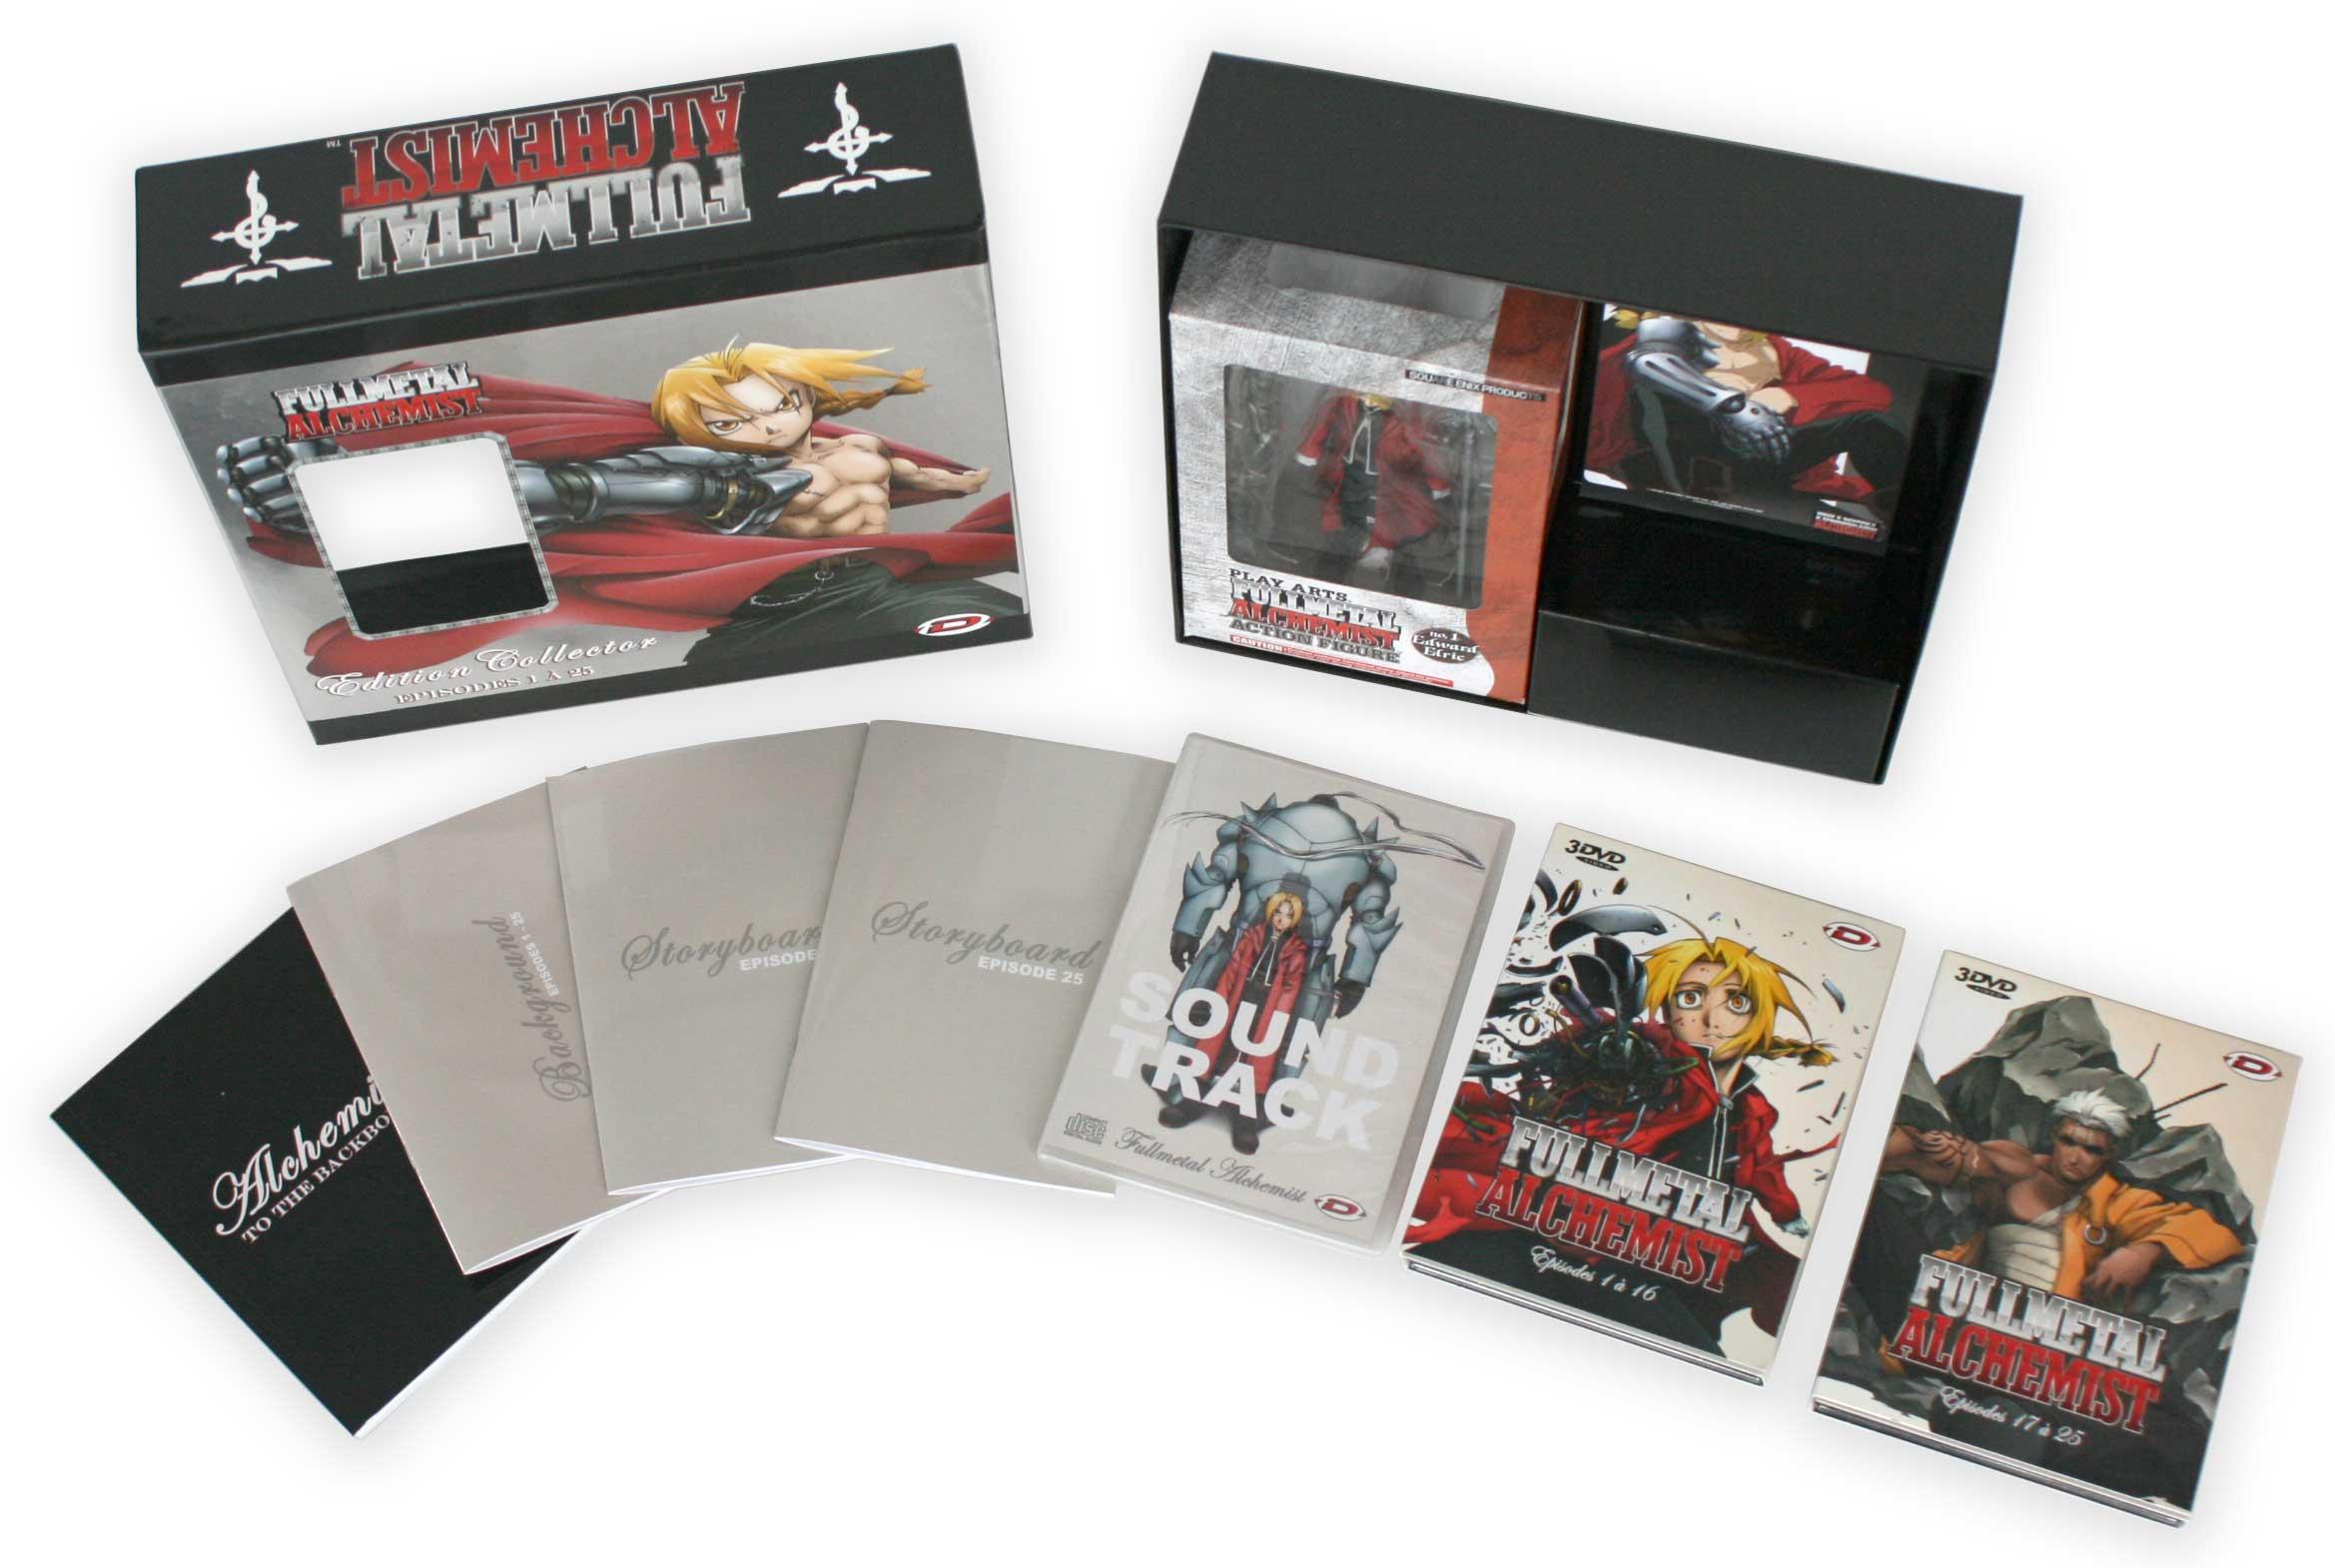 Fullmetal Alchemist Box DVD collector 1 (Dybex - 2008)